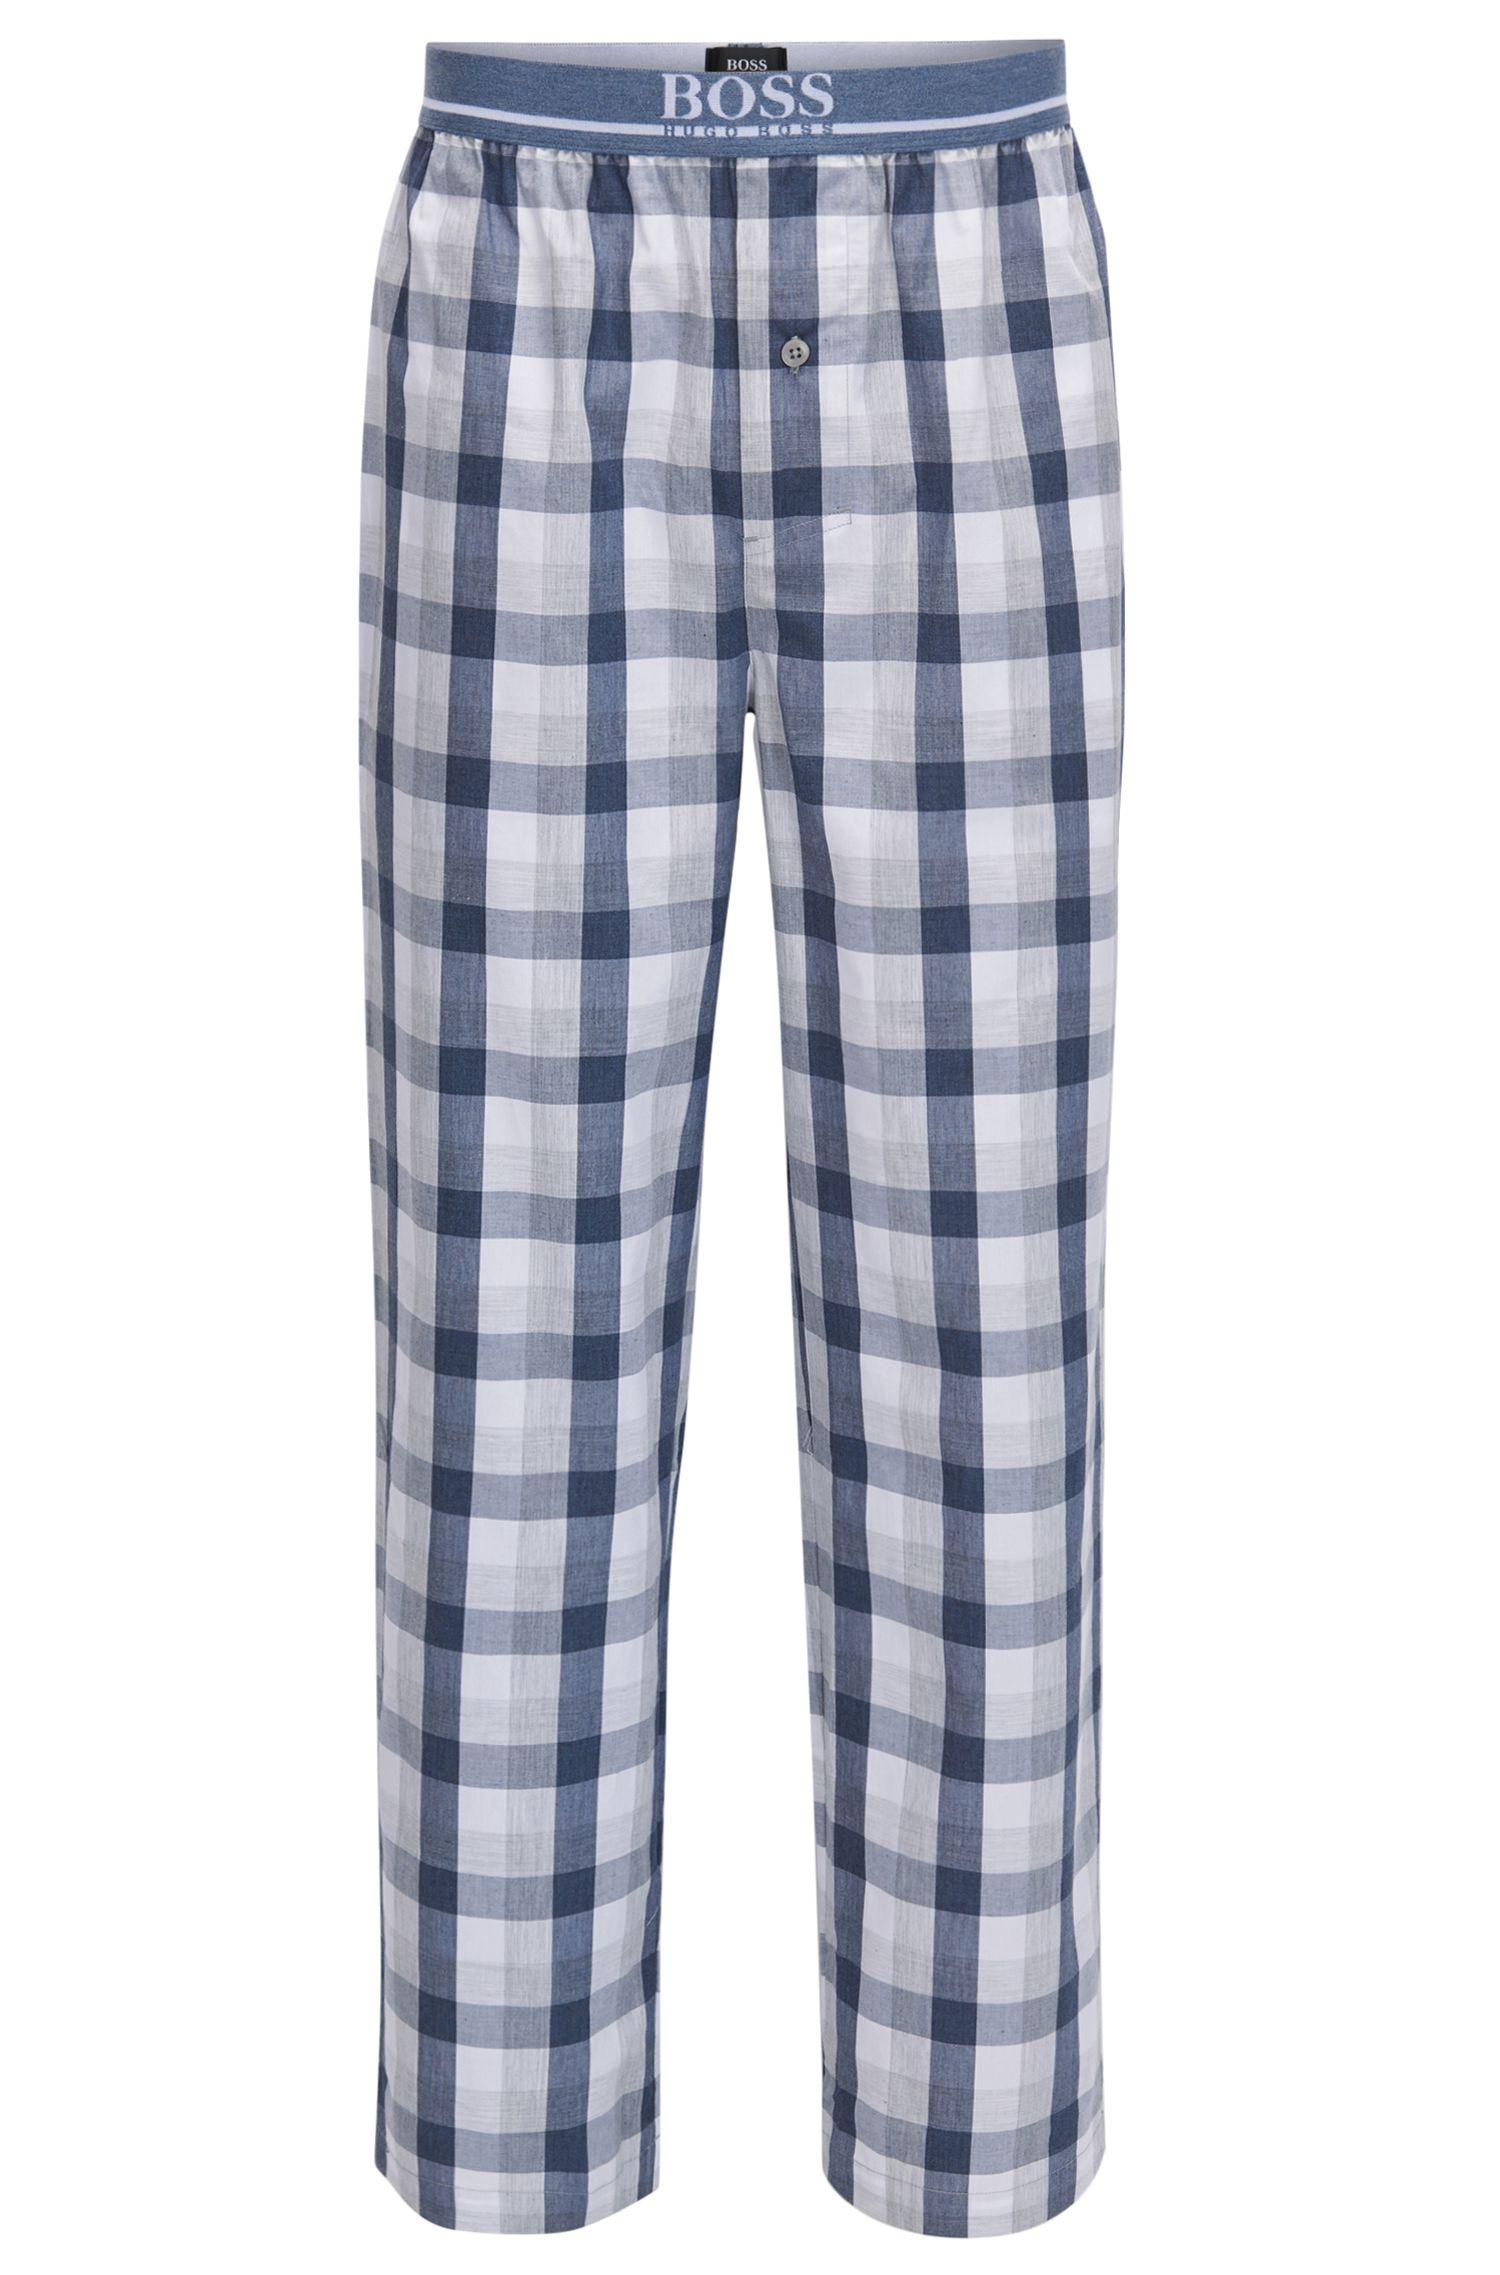 Karierte Pyjama-Hose aus Baumwoll-Popeline in Denim-Optik